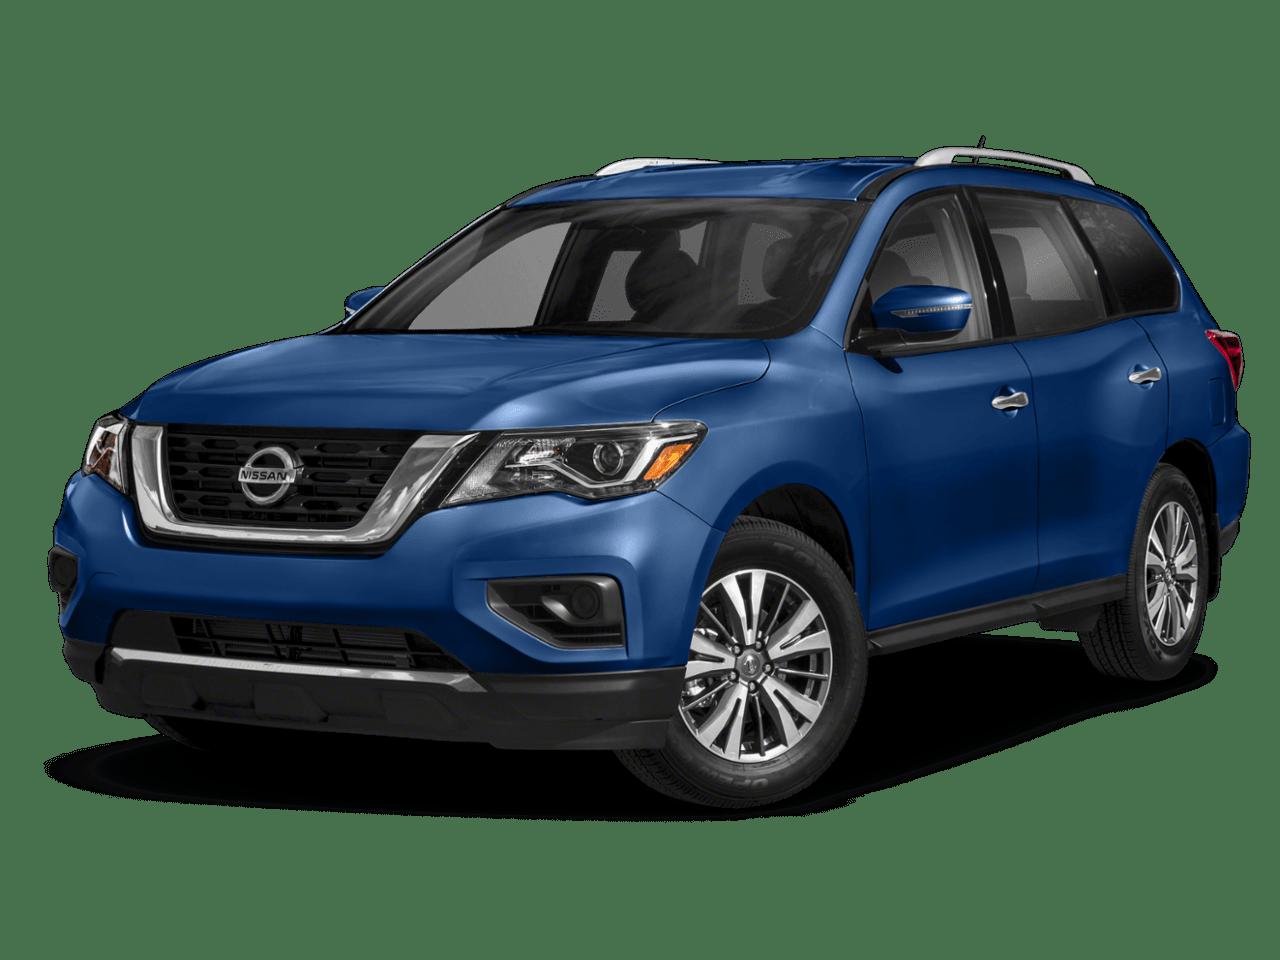 2019_Nissan_Pathfinder_Big